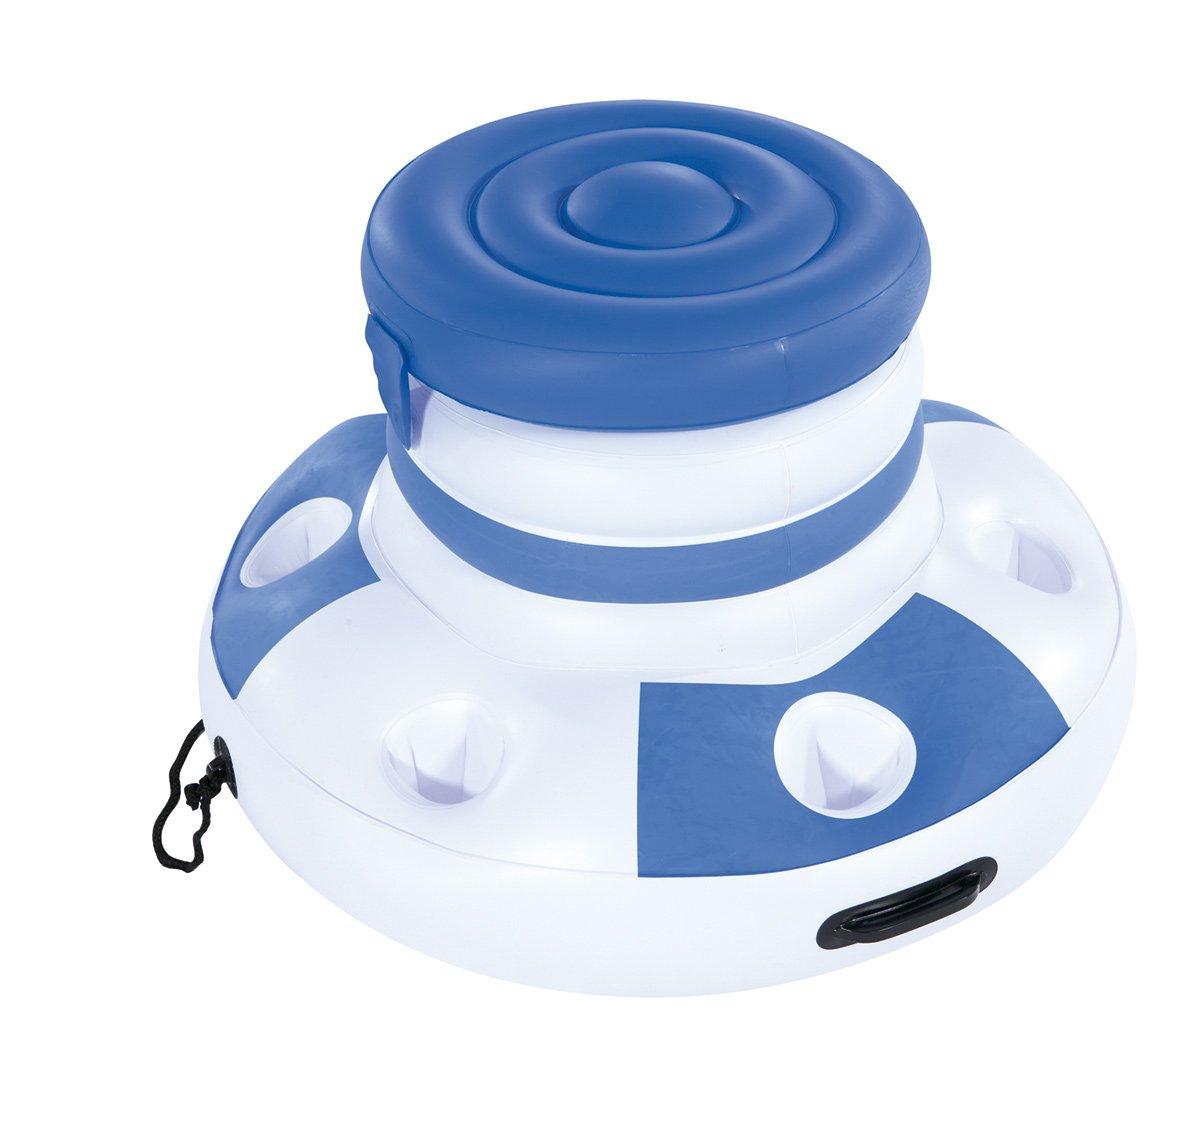 Bestway Getränkekühler Floating Cooler